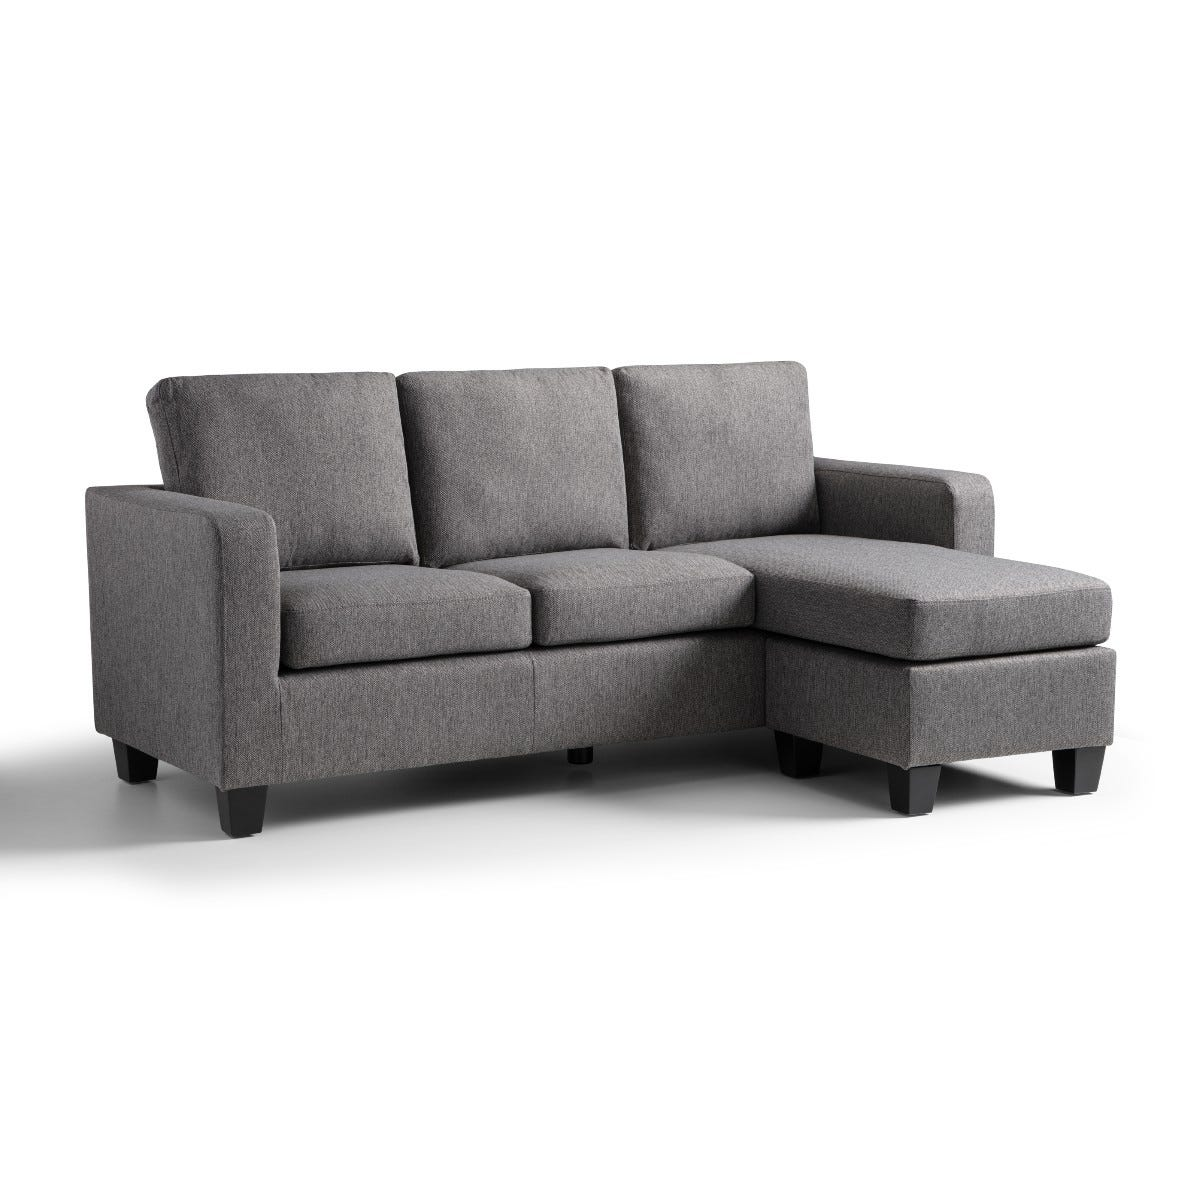 Berlin Corner Fabric Sofa Tweed Grey